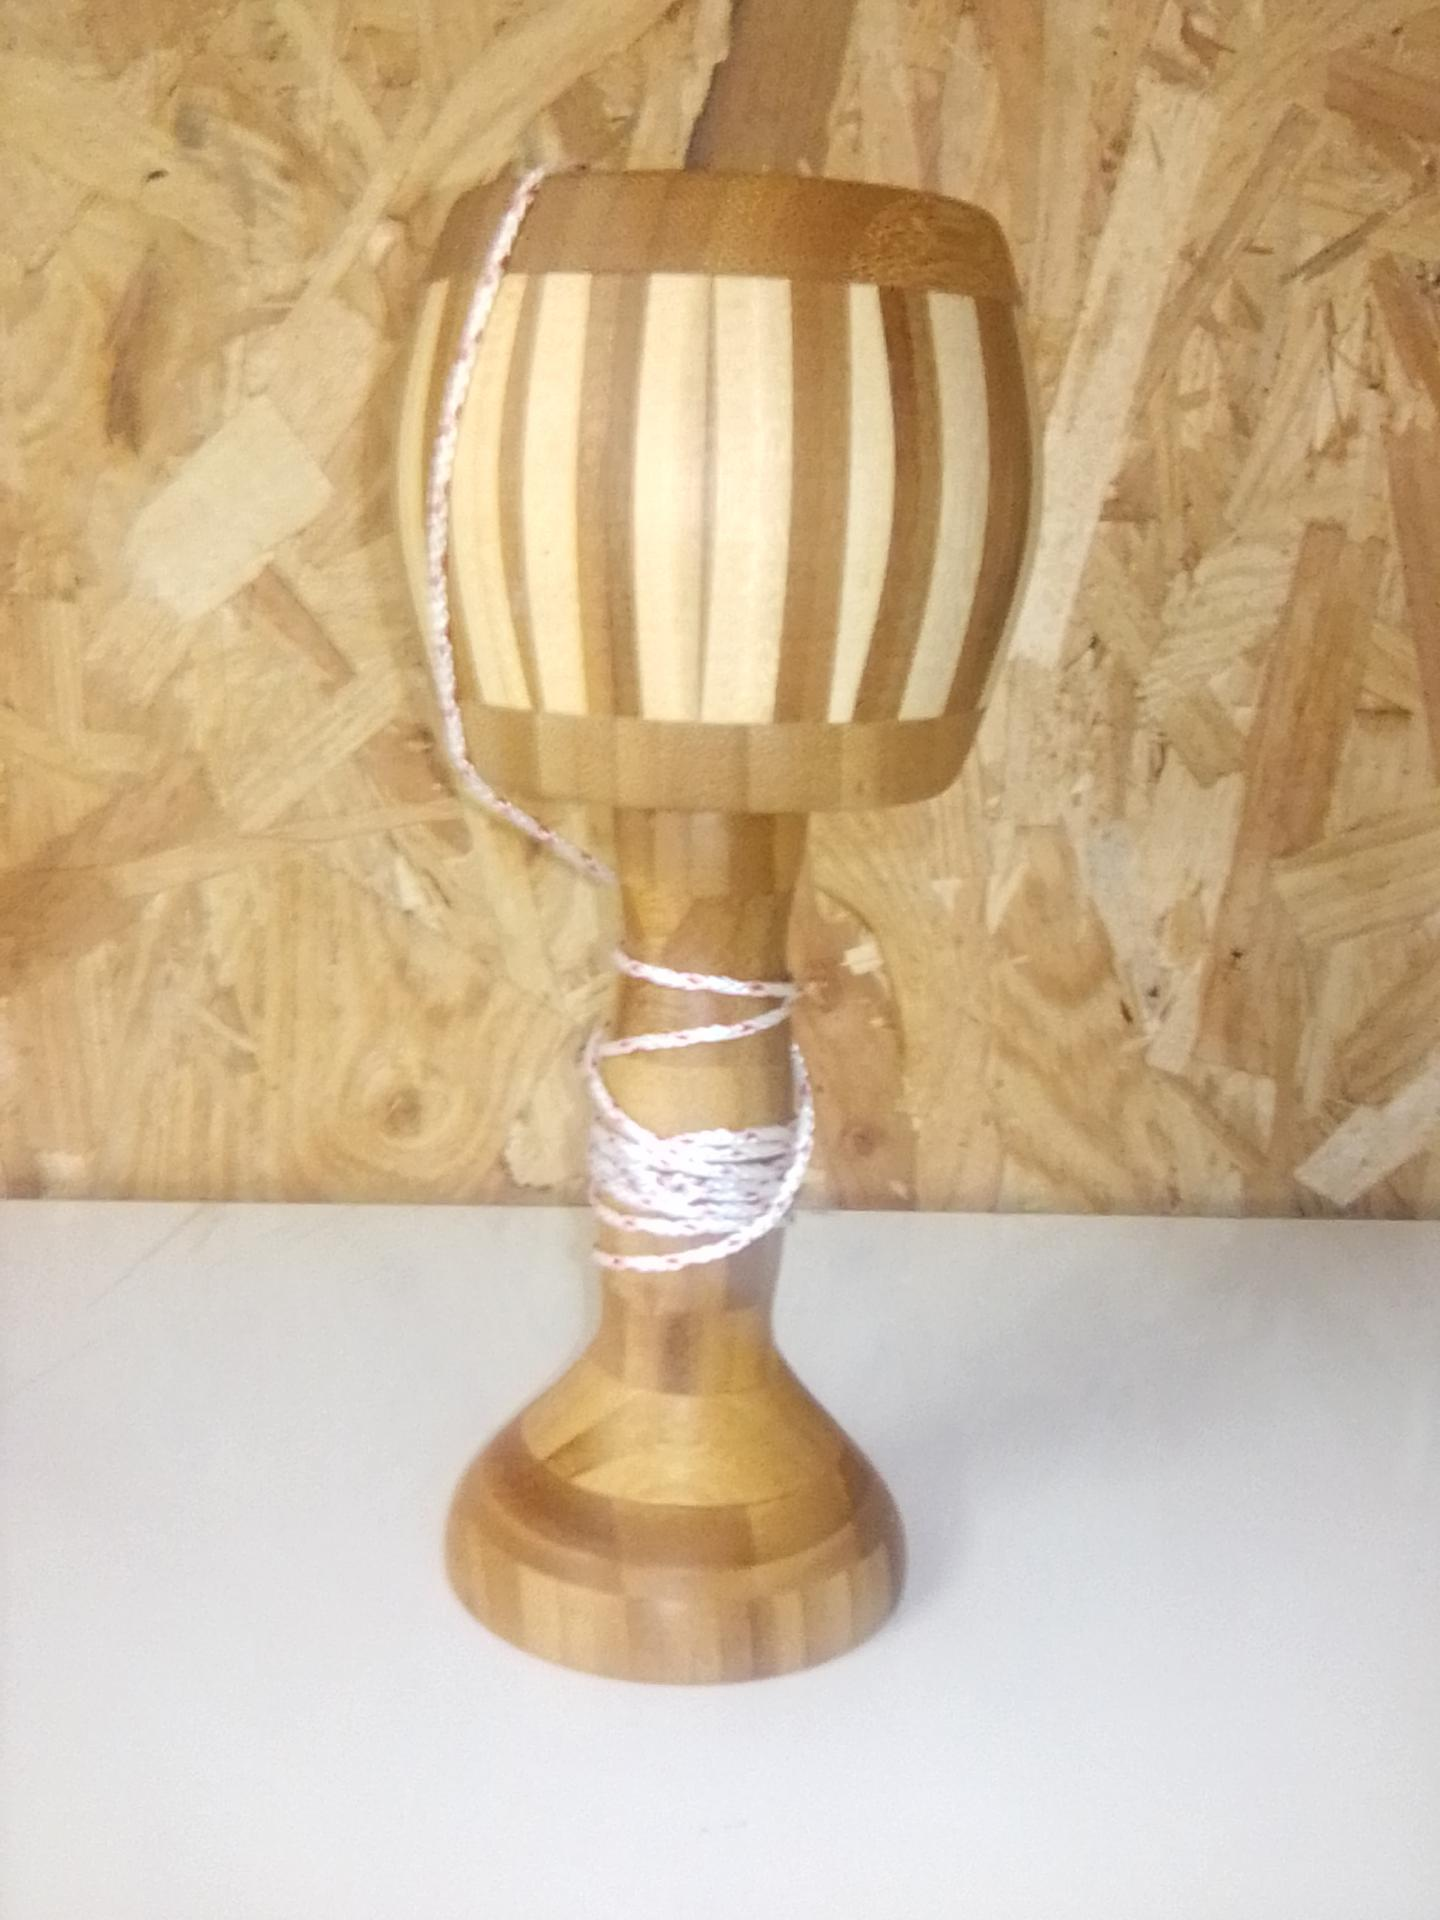 Bilboquet en bambou collés